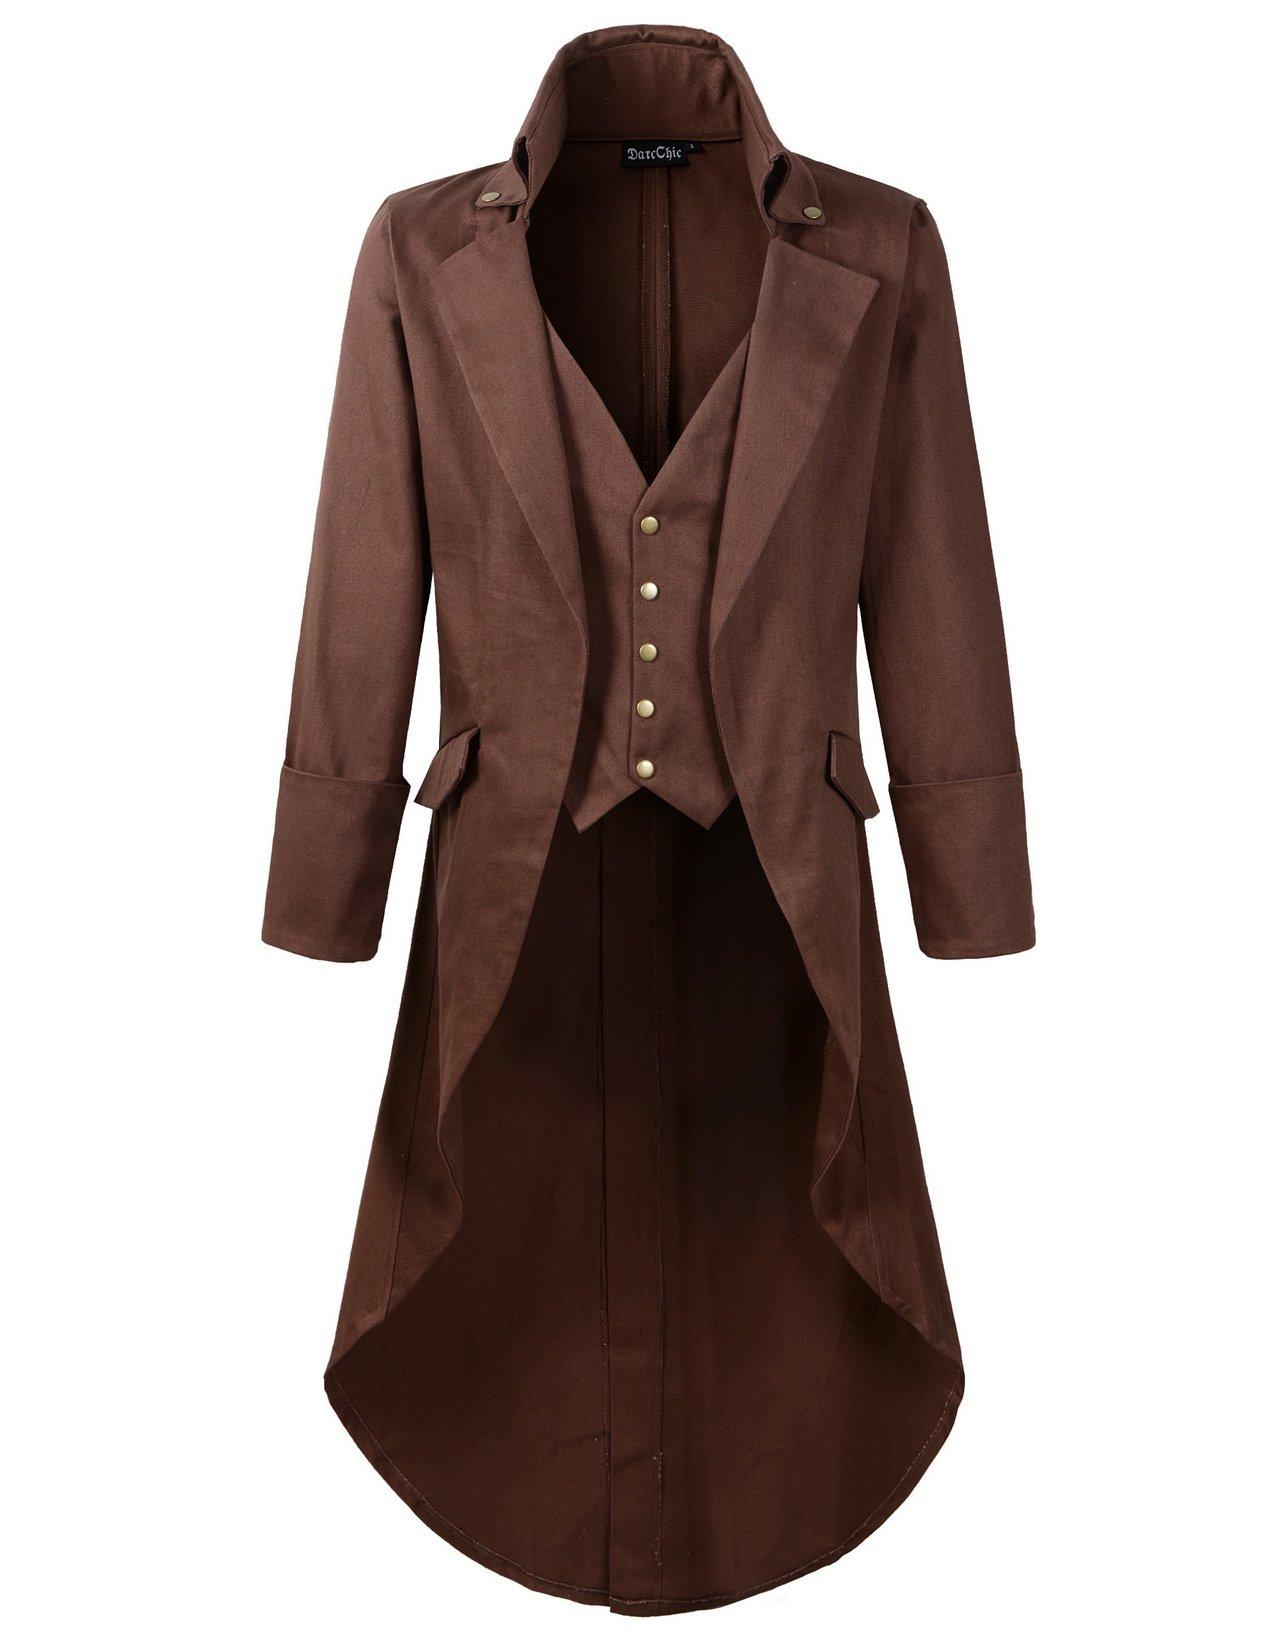 DarcChic Mens Gothic Tailcoat Jacket Black Steampunk VTG Victorian High Collar Coat (L, Brown)